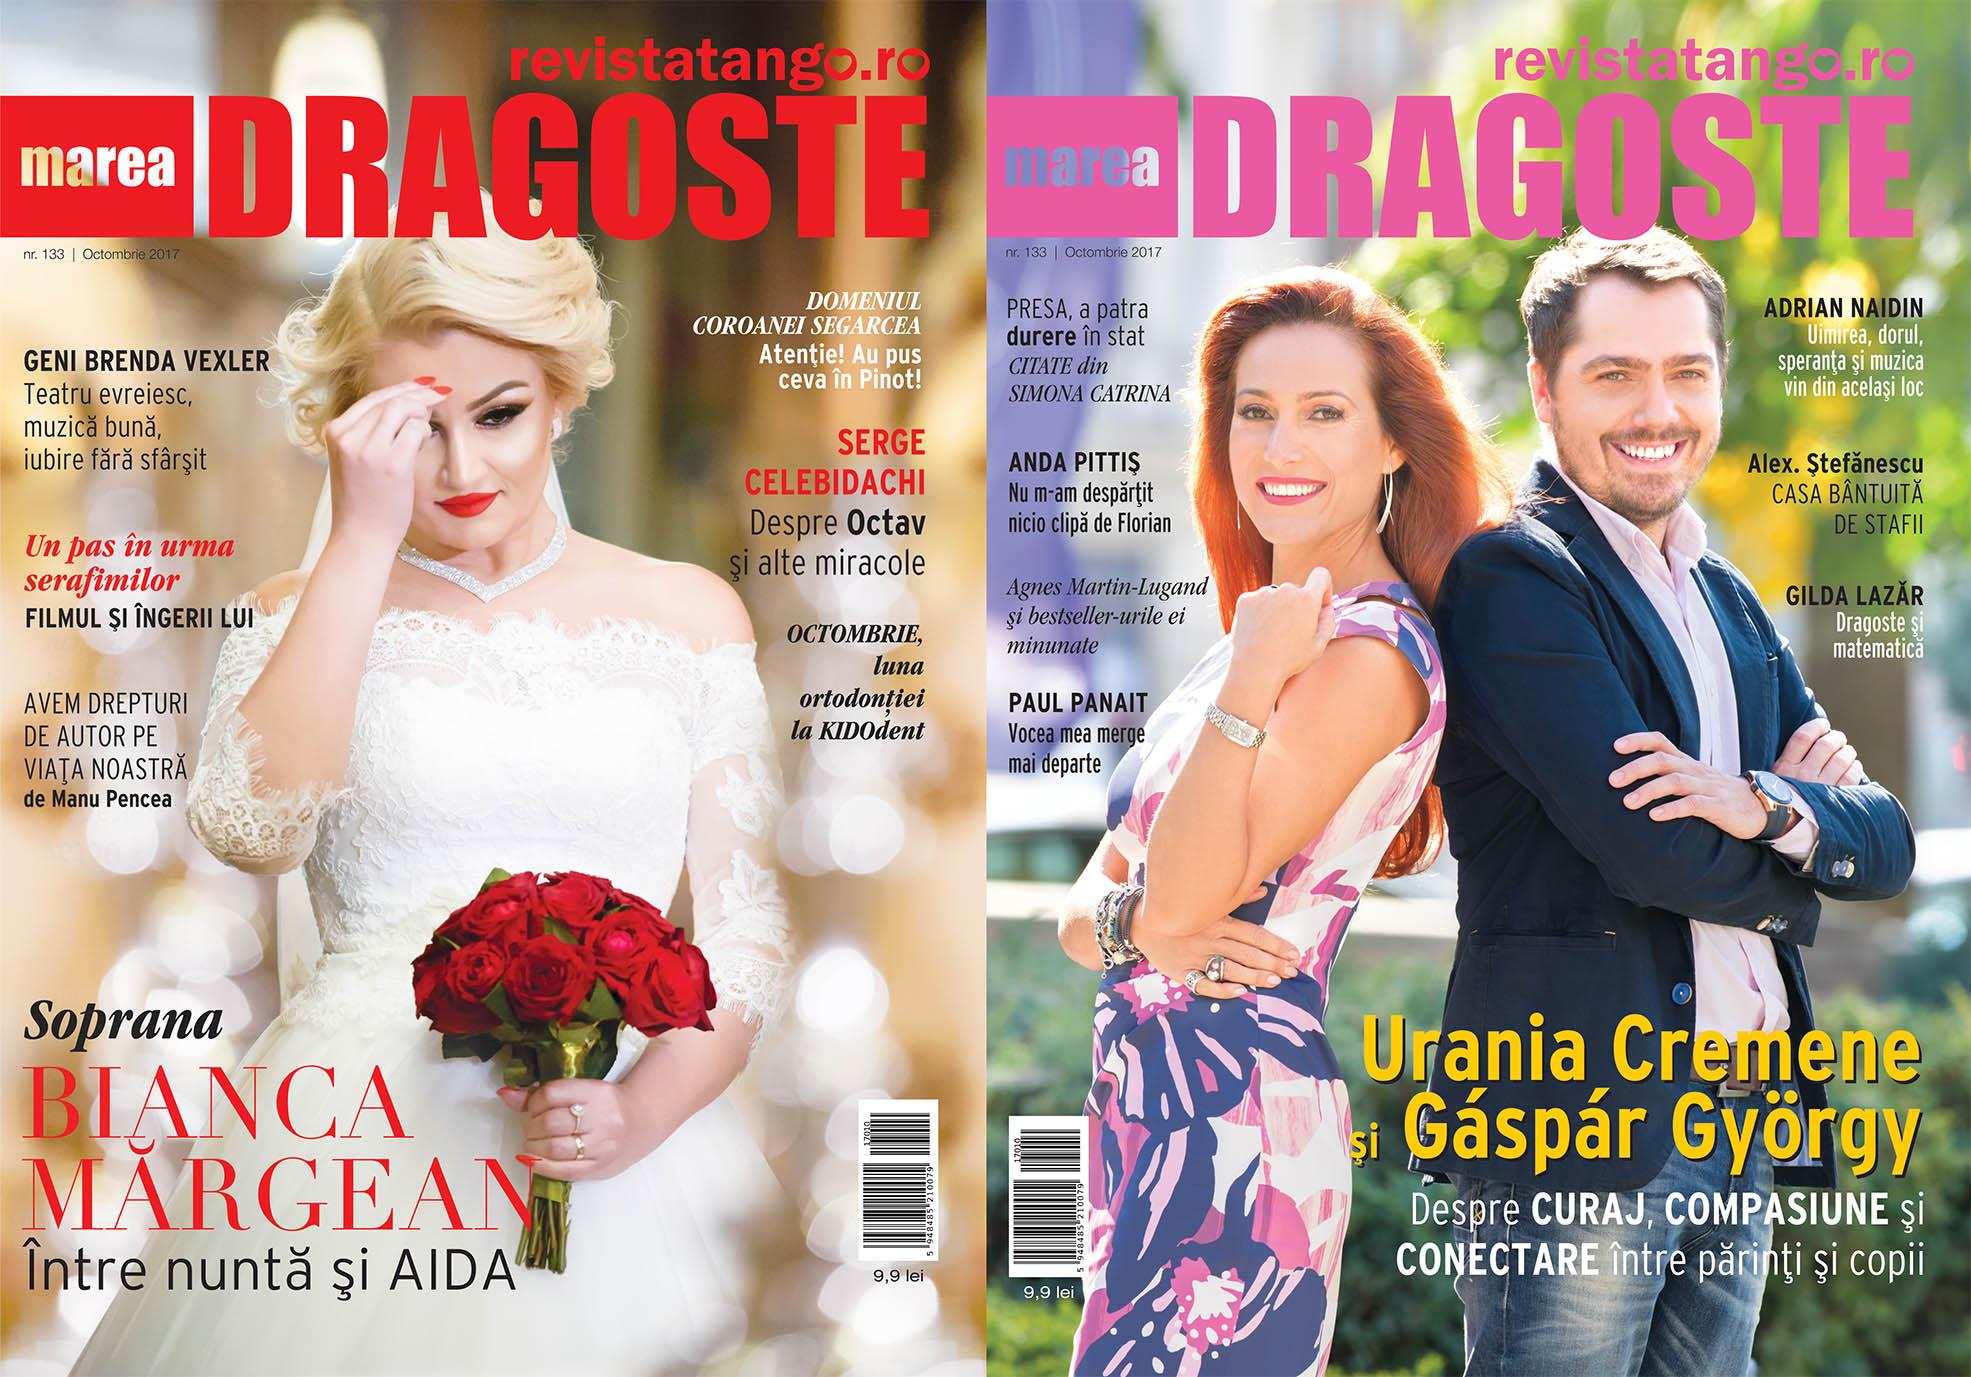 Bianca Margean respectiv Gáspár György si Urania Cremene pe copertele Marea Dragoste-revistatango.ro, nr. 133, octombrie 2017